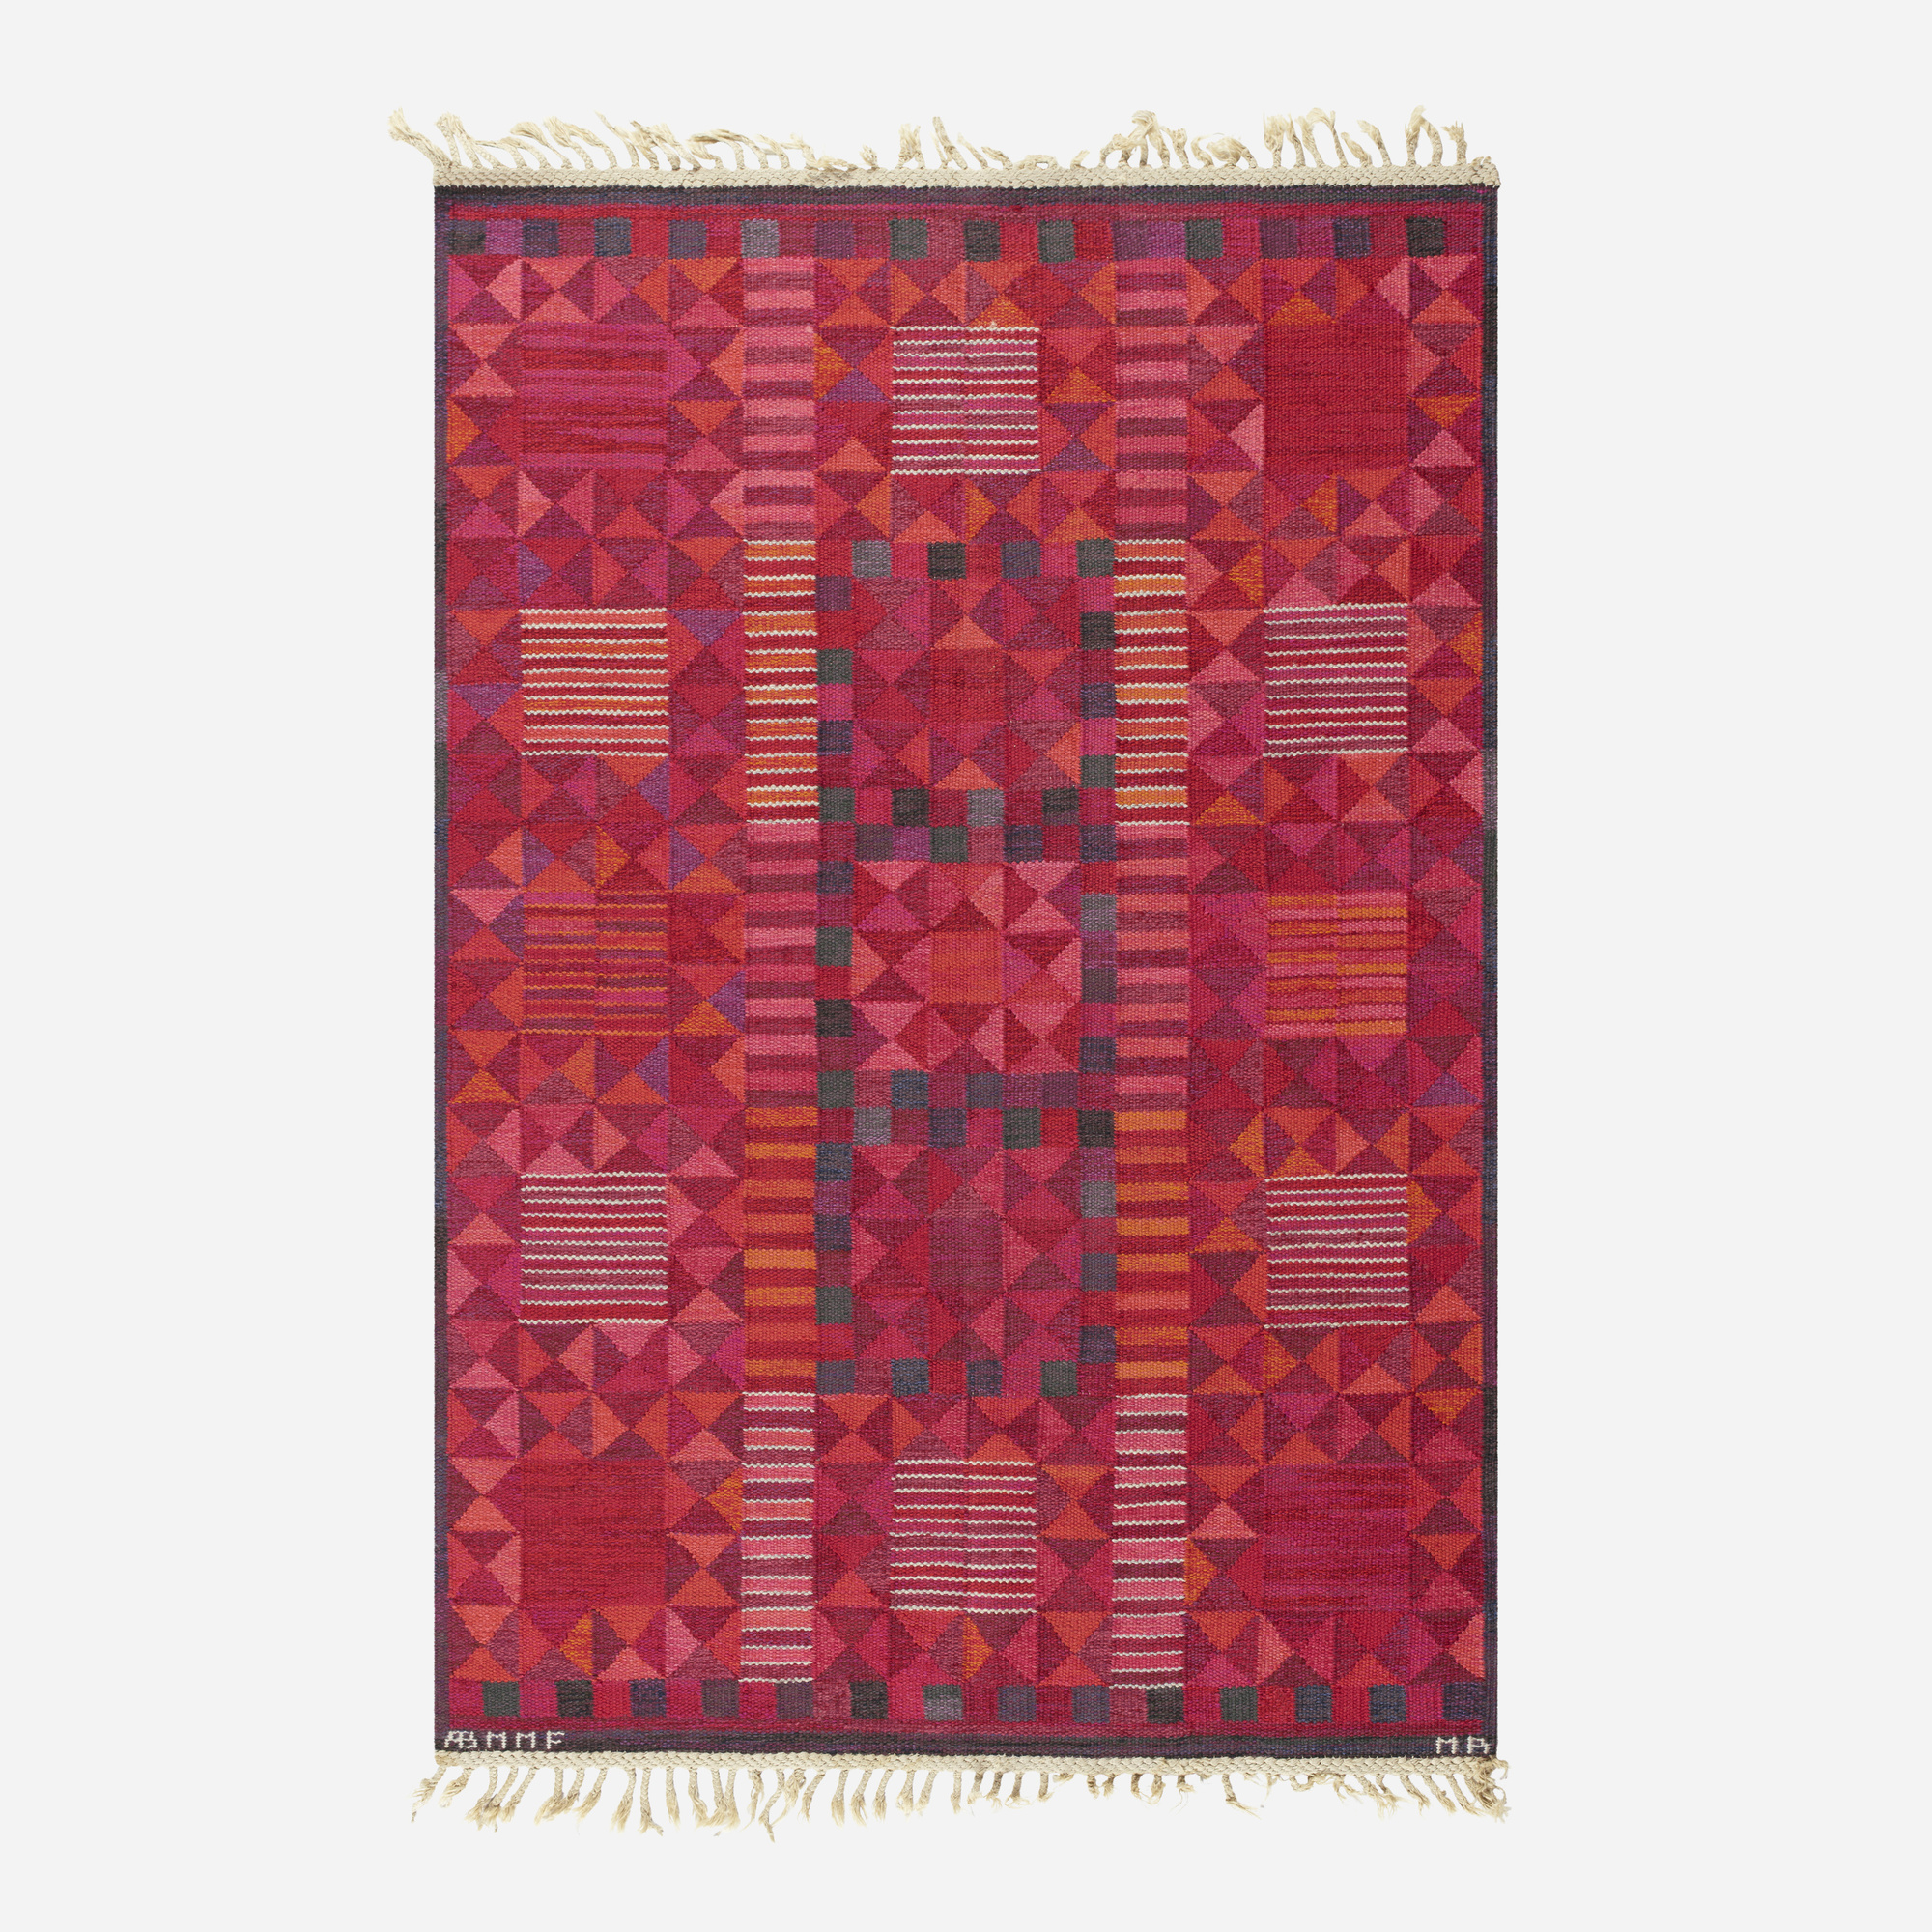 151: Marianne Richter / Rubirosa flatweave carpet (1 of 3)